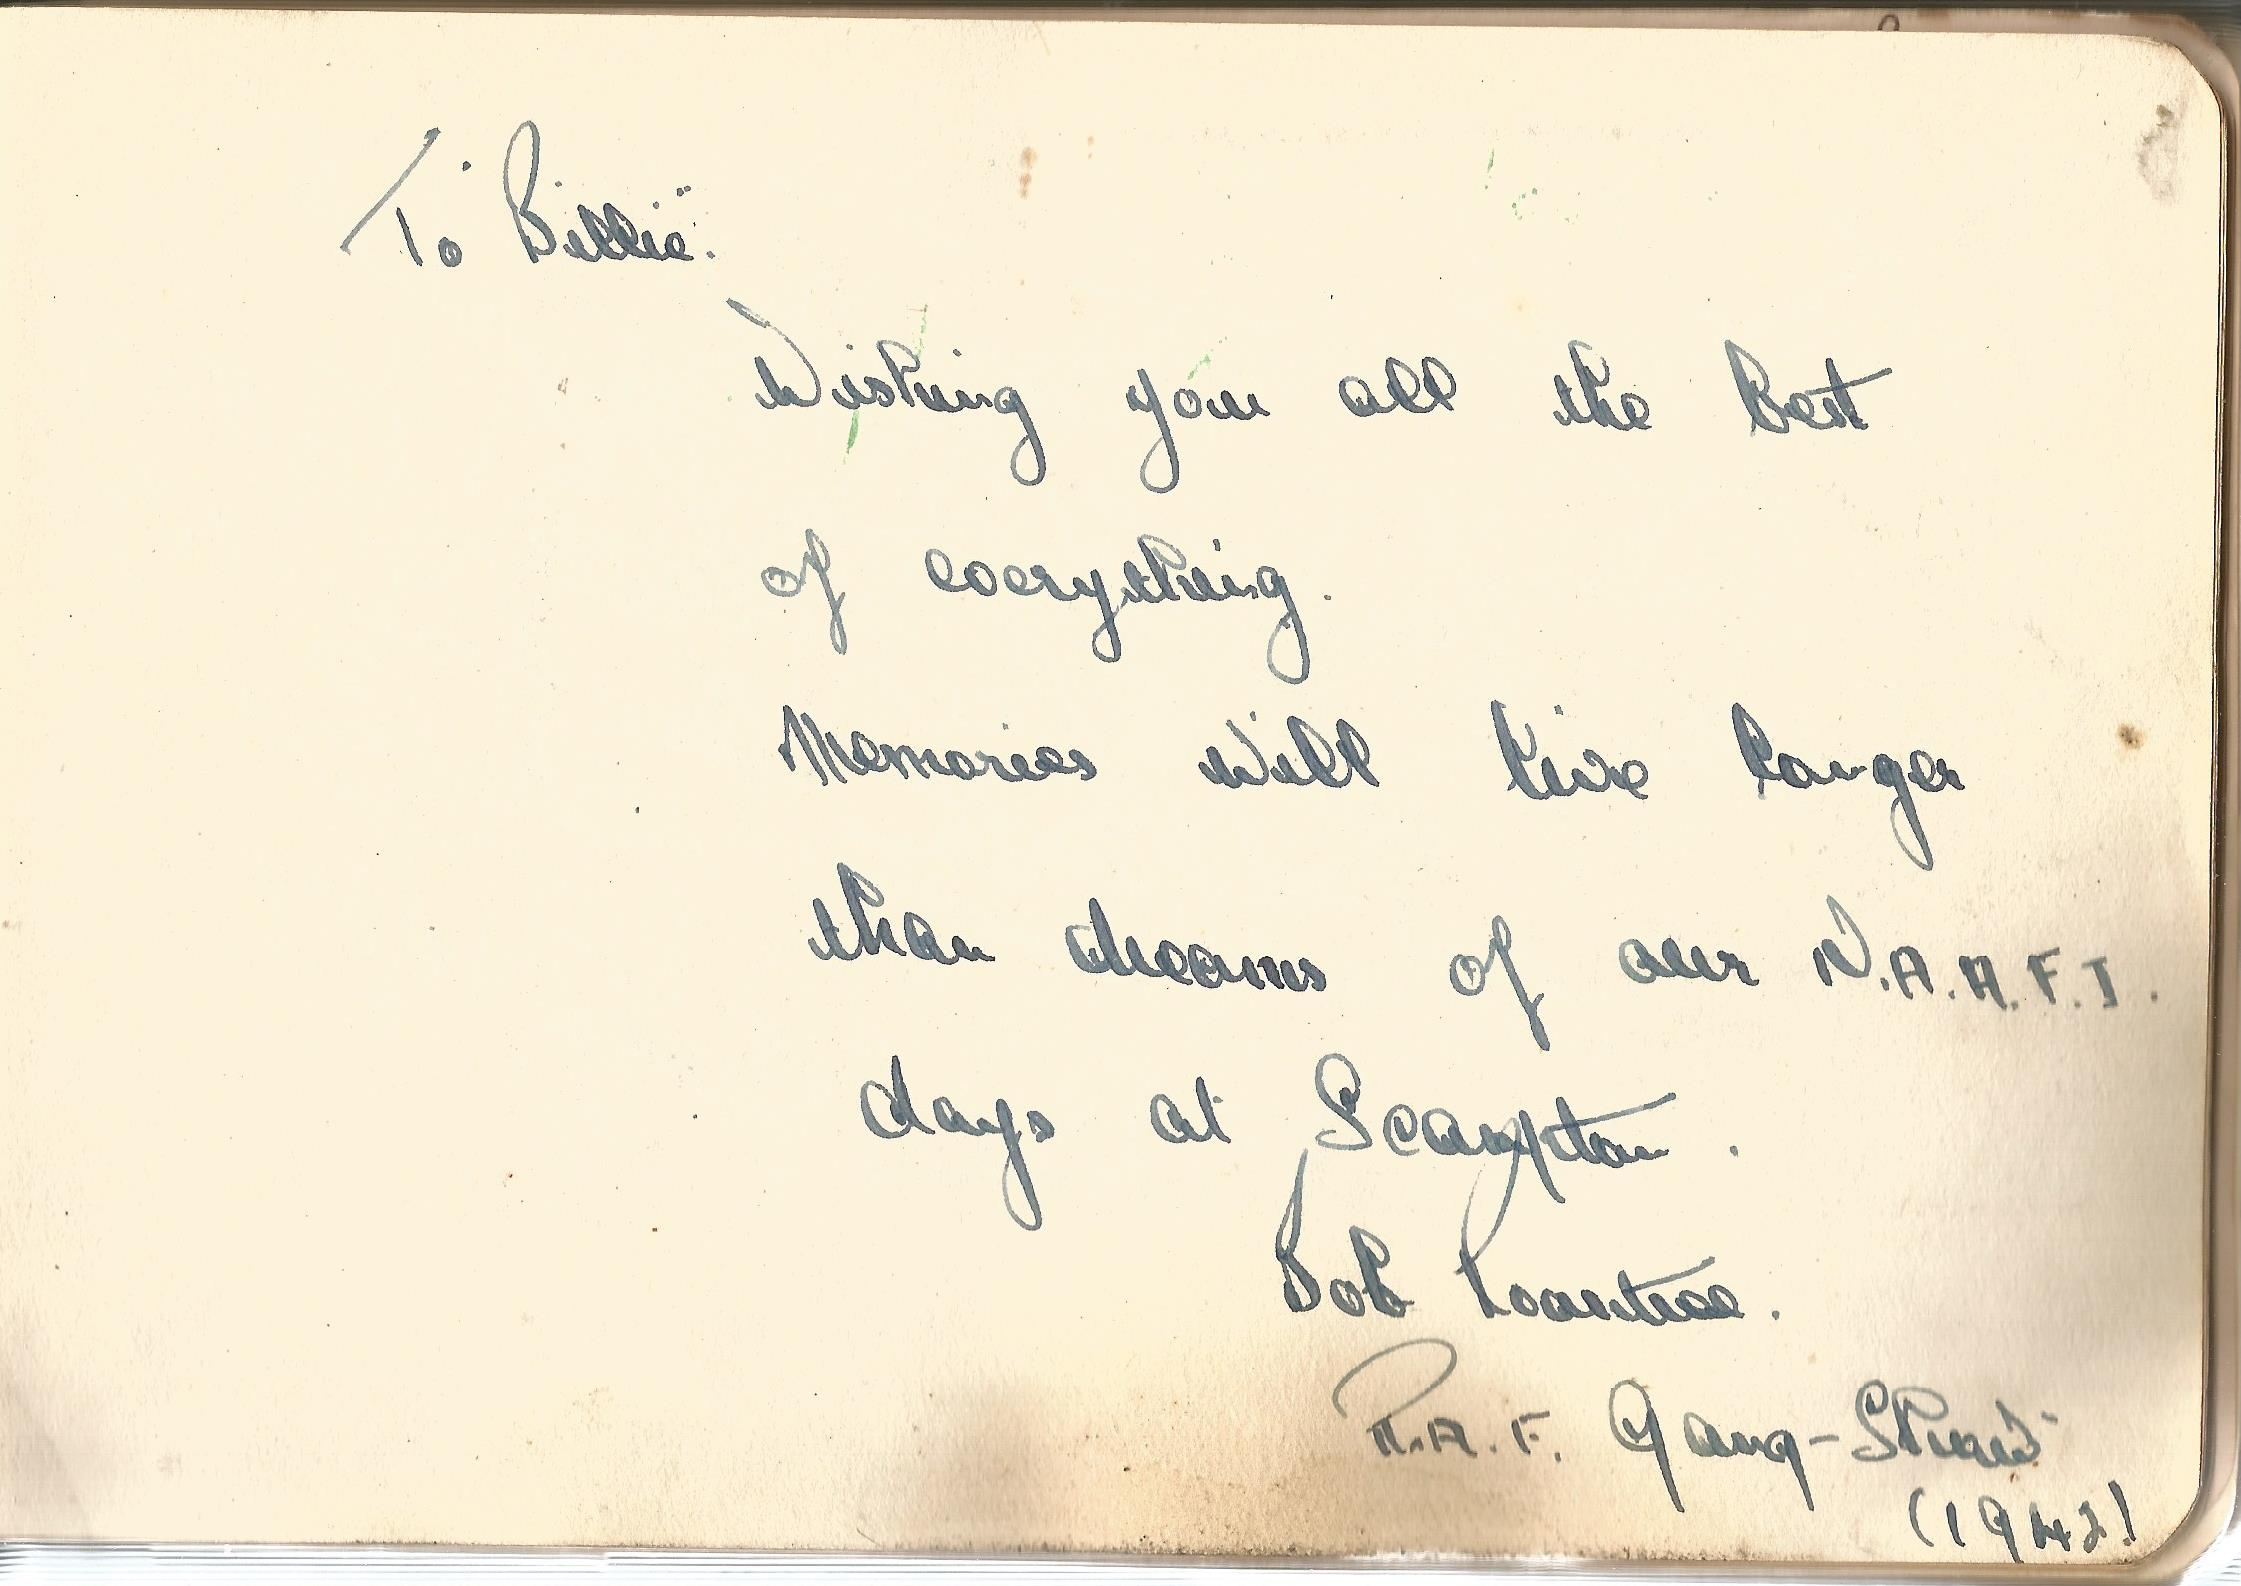 RAF Scampton. 1940-43. Autograph Album. 19cm wide x 13cm tall. Green cloth. Over 250 signatures.